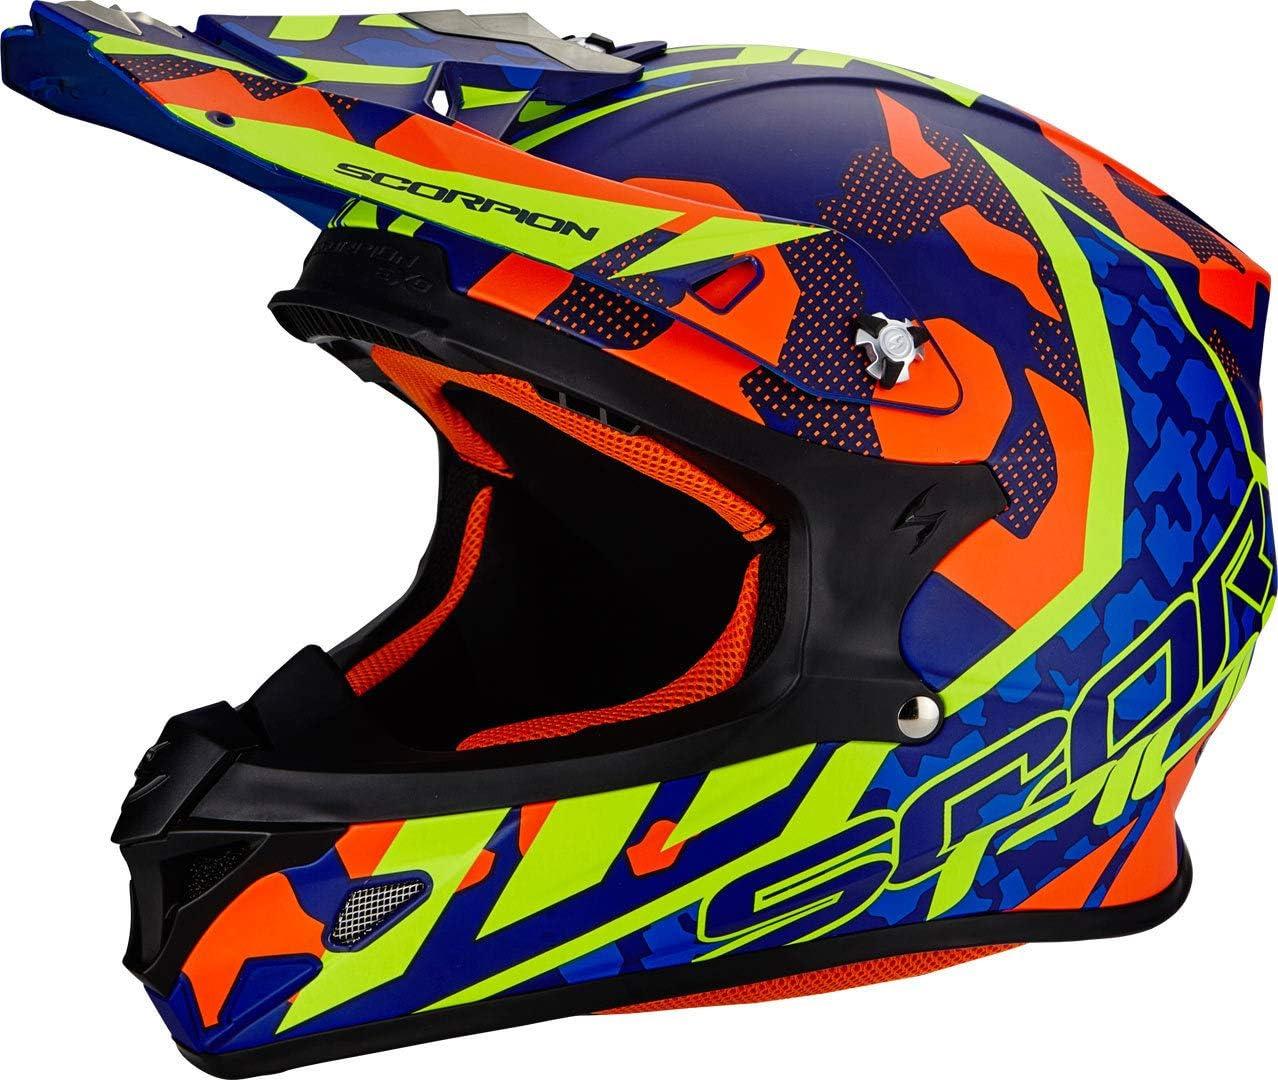 Black//Neon Red Scorpion Casco Moto VX-21/Air mudirt XS